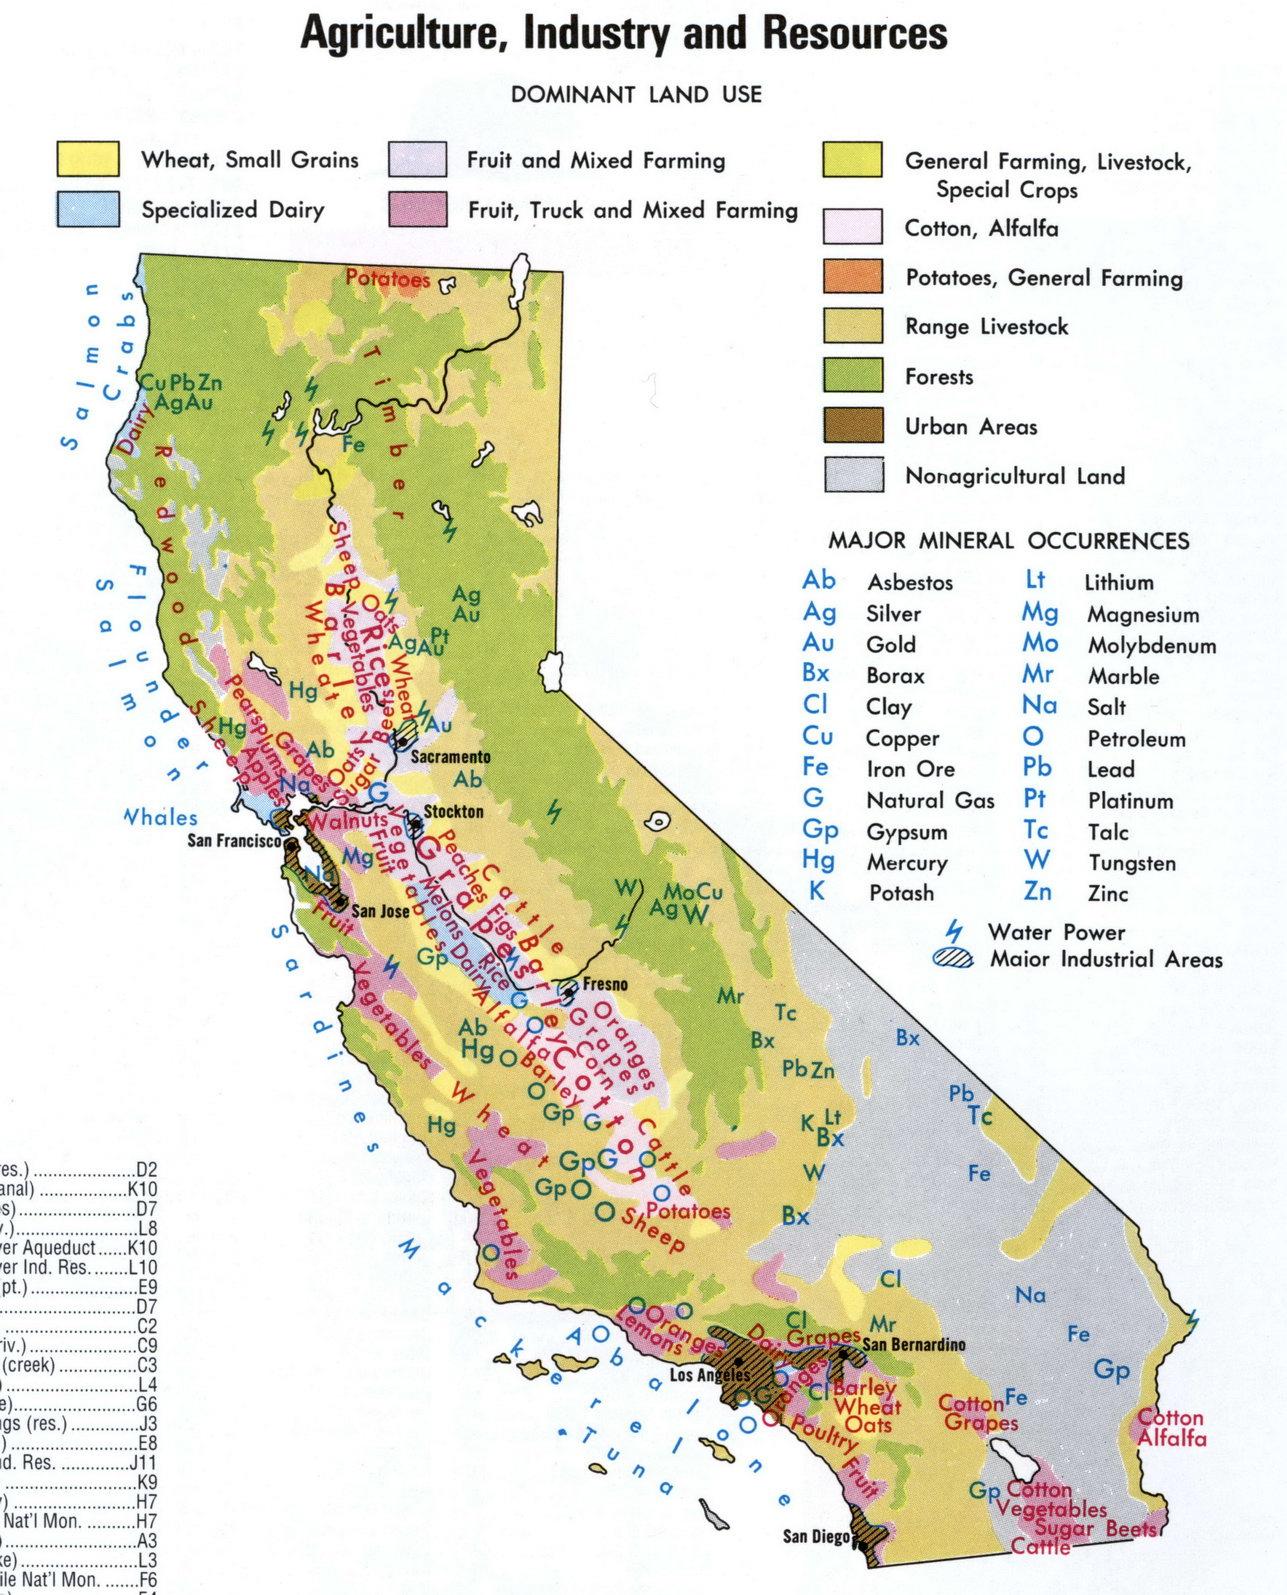 National Parks Map California - Klipy - Map Of California National Parks And Monuments